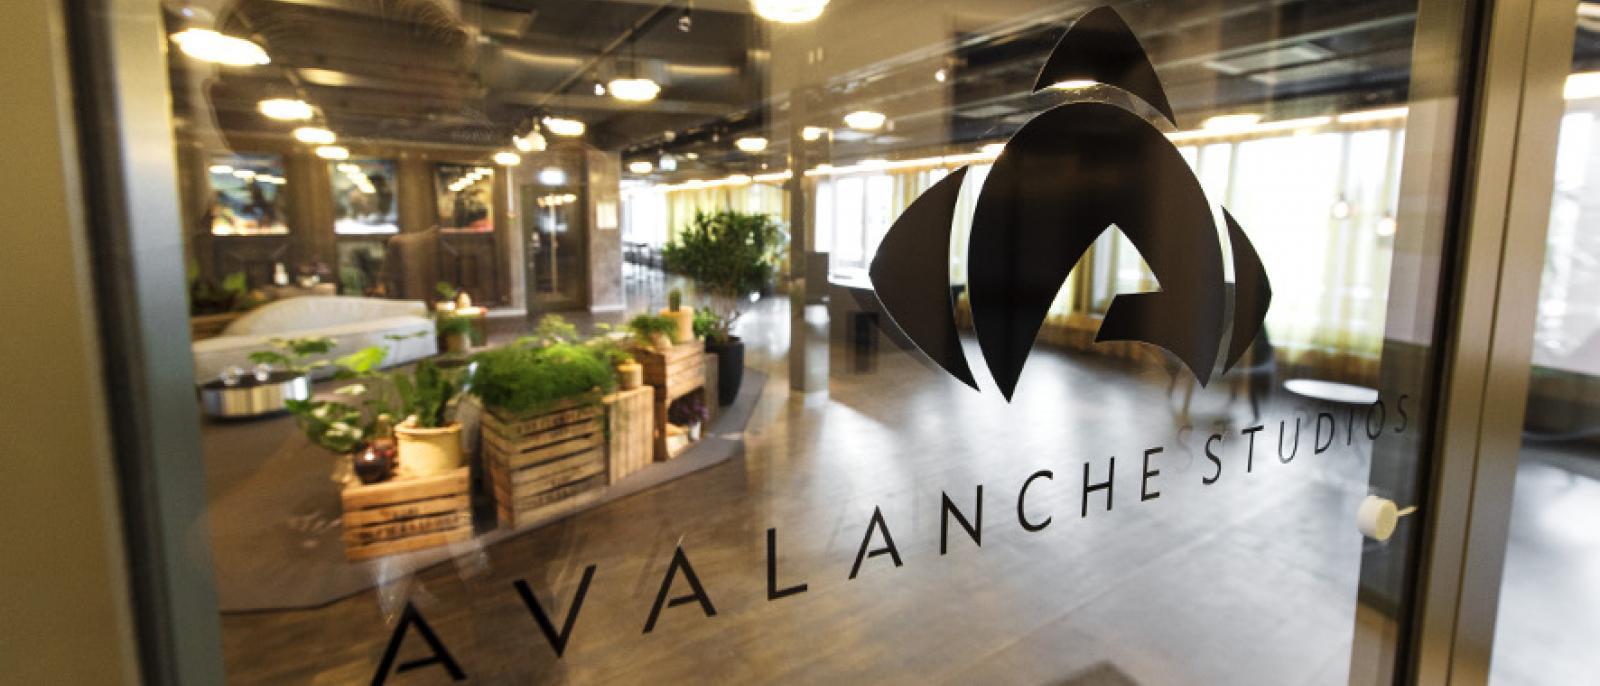 Avalanche Studios Office Inside